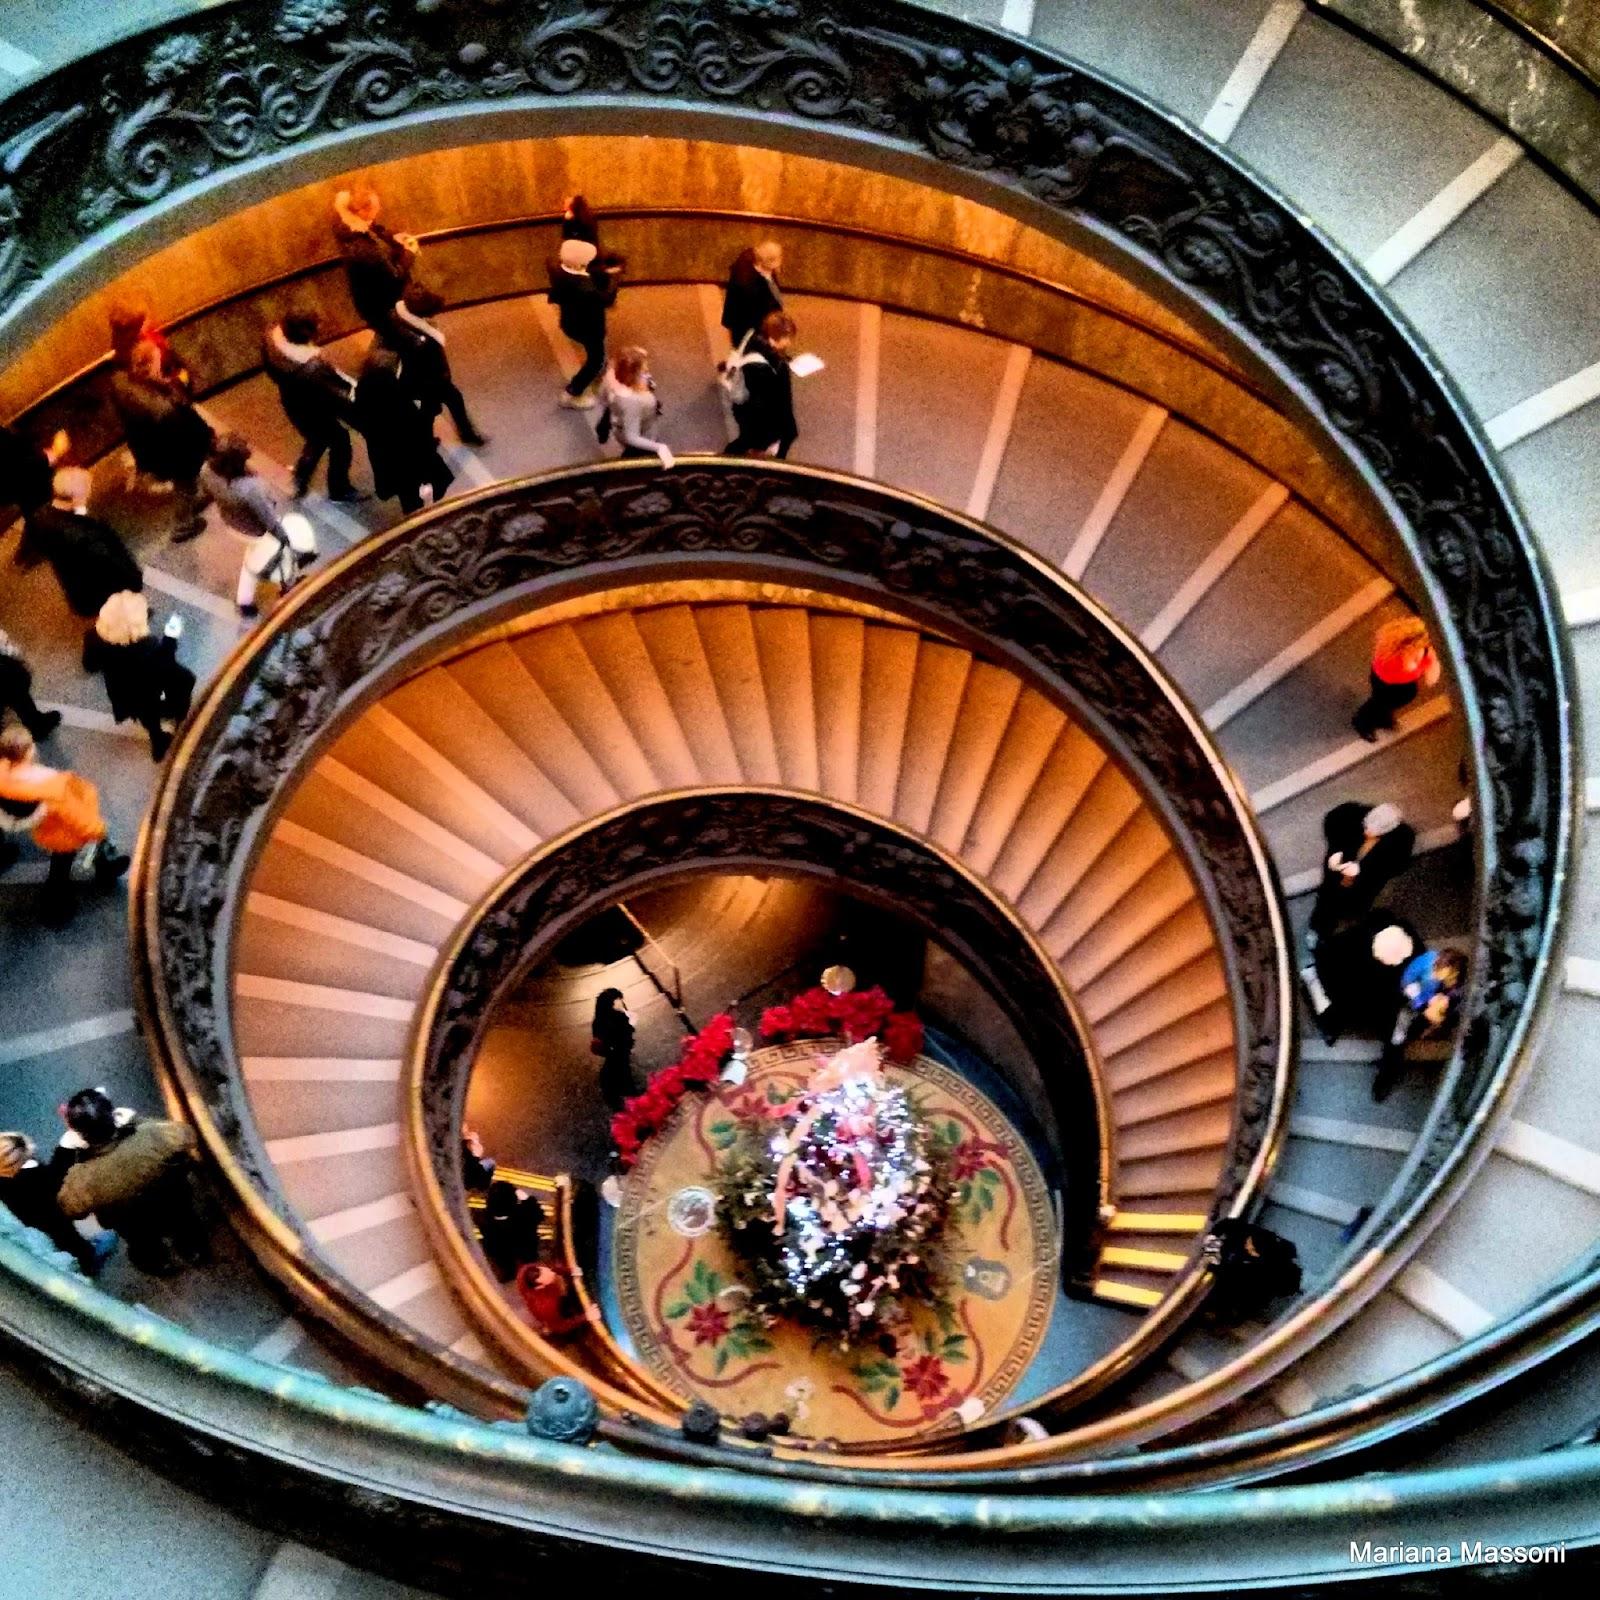 Roma por Mariana Massoni